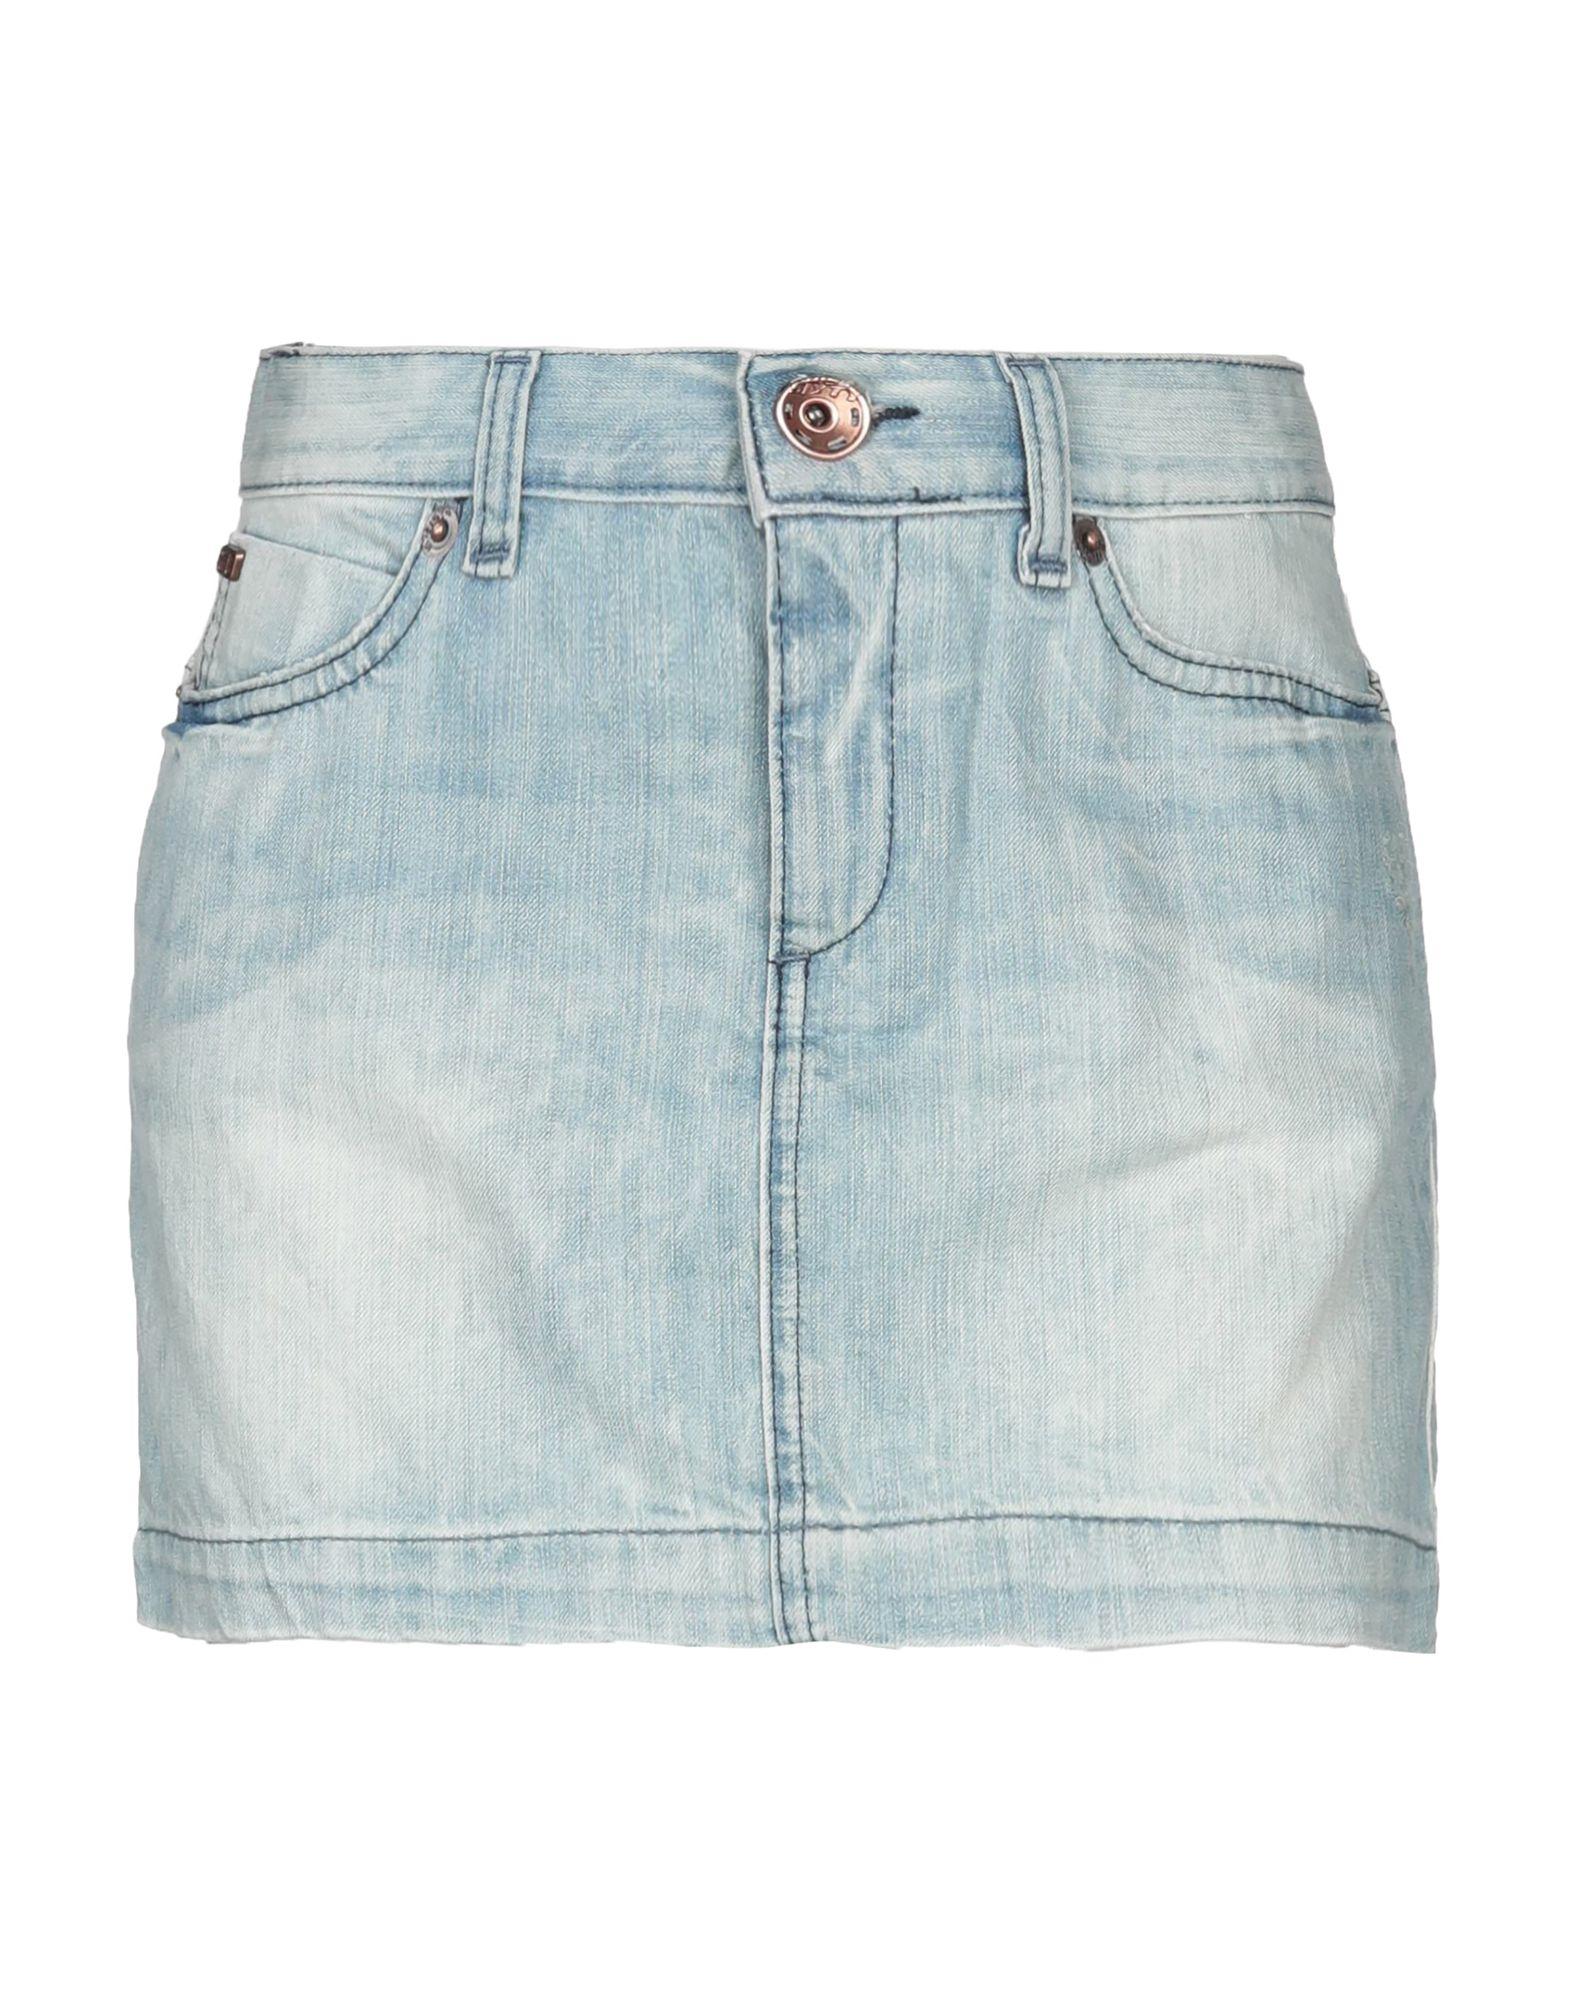 MISS SIXTY Джинсовая юбка